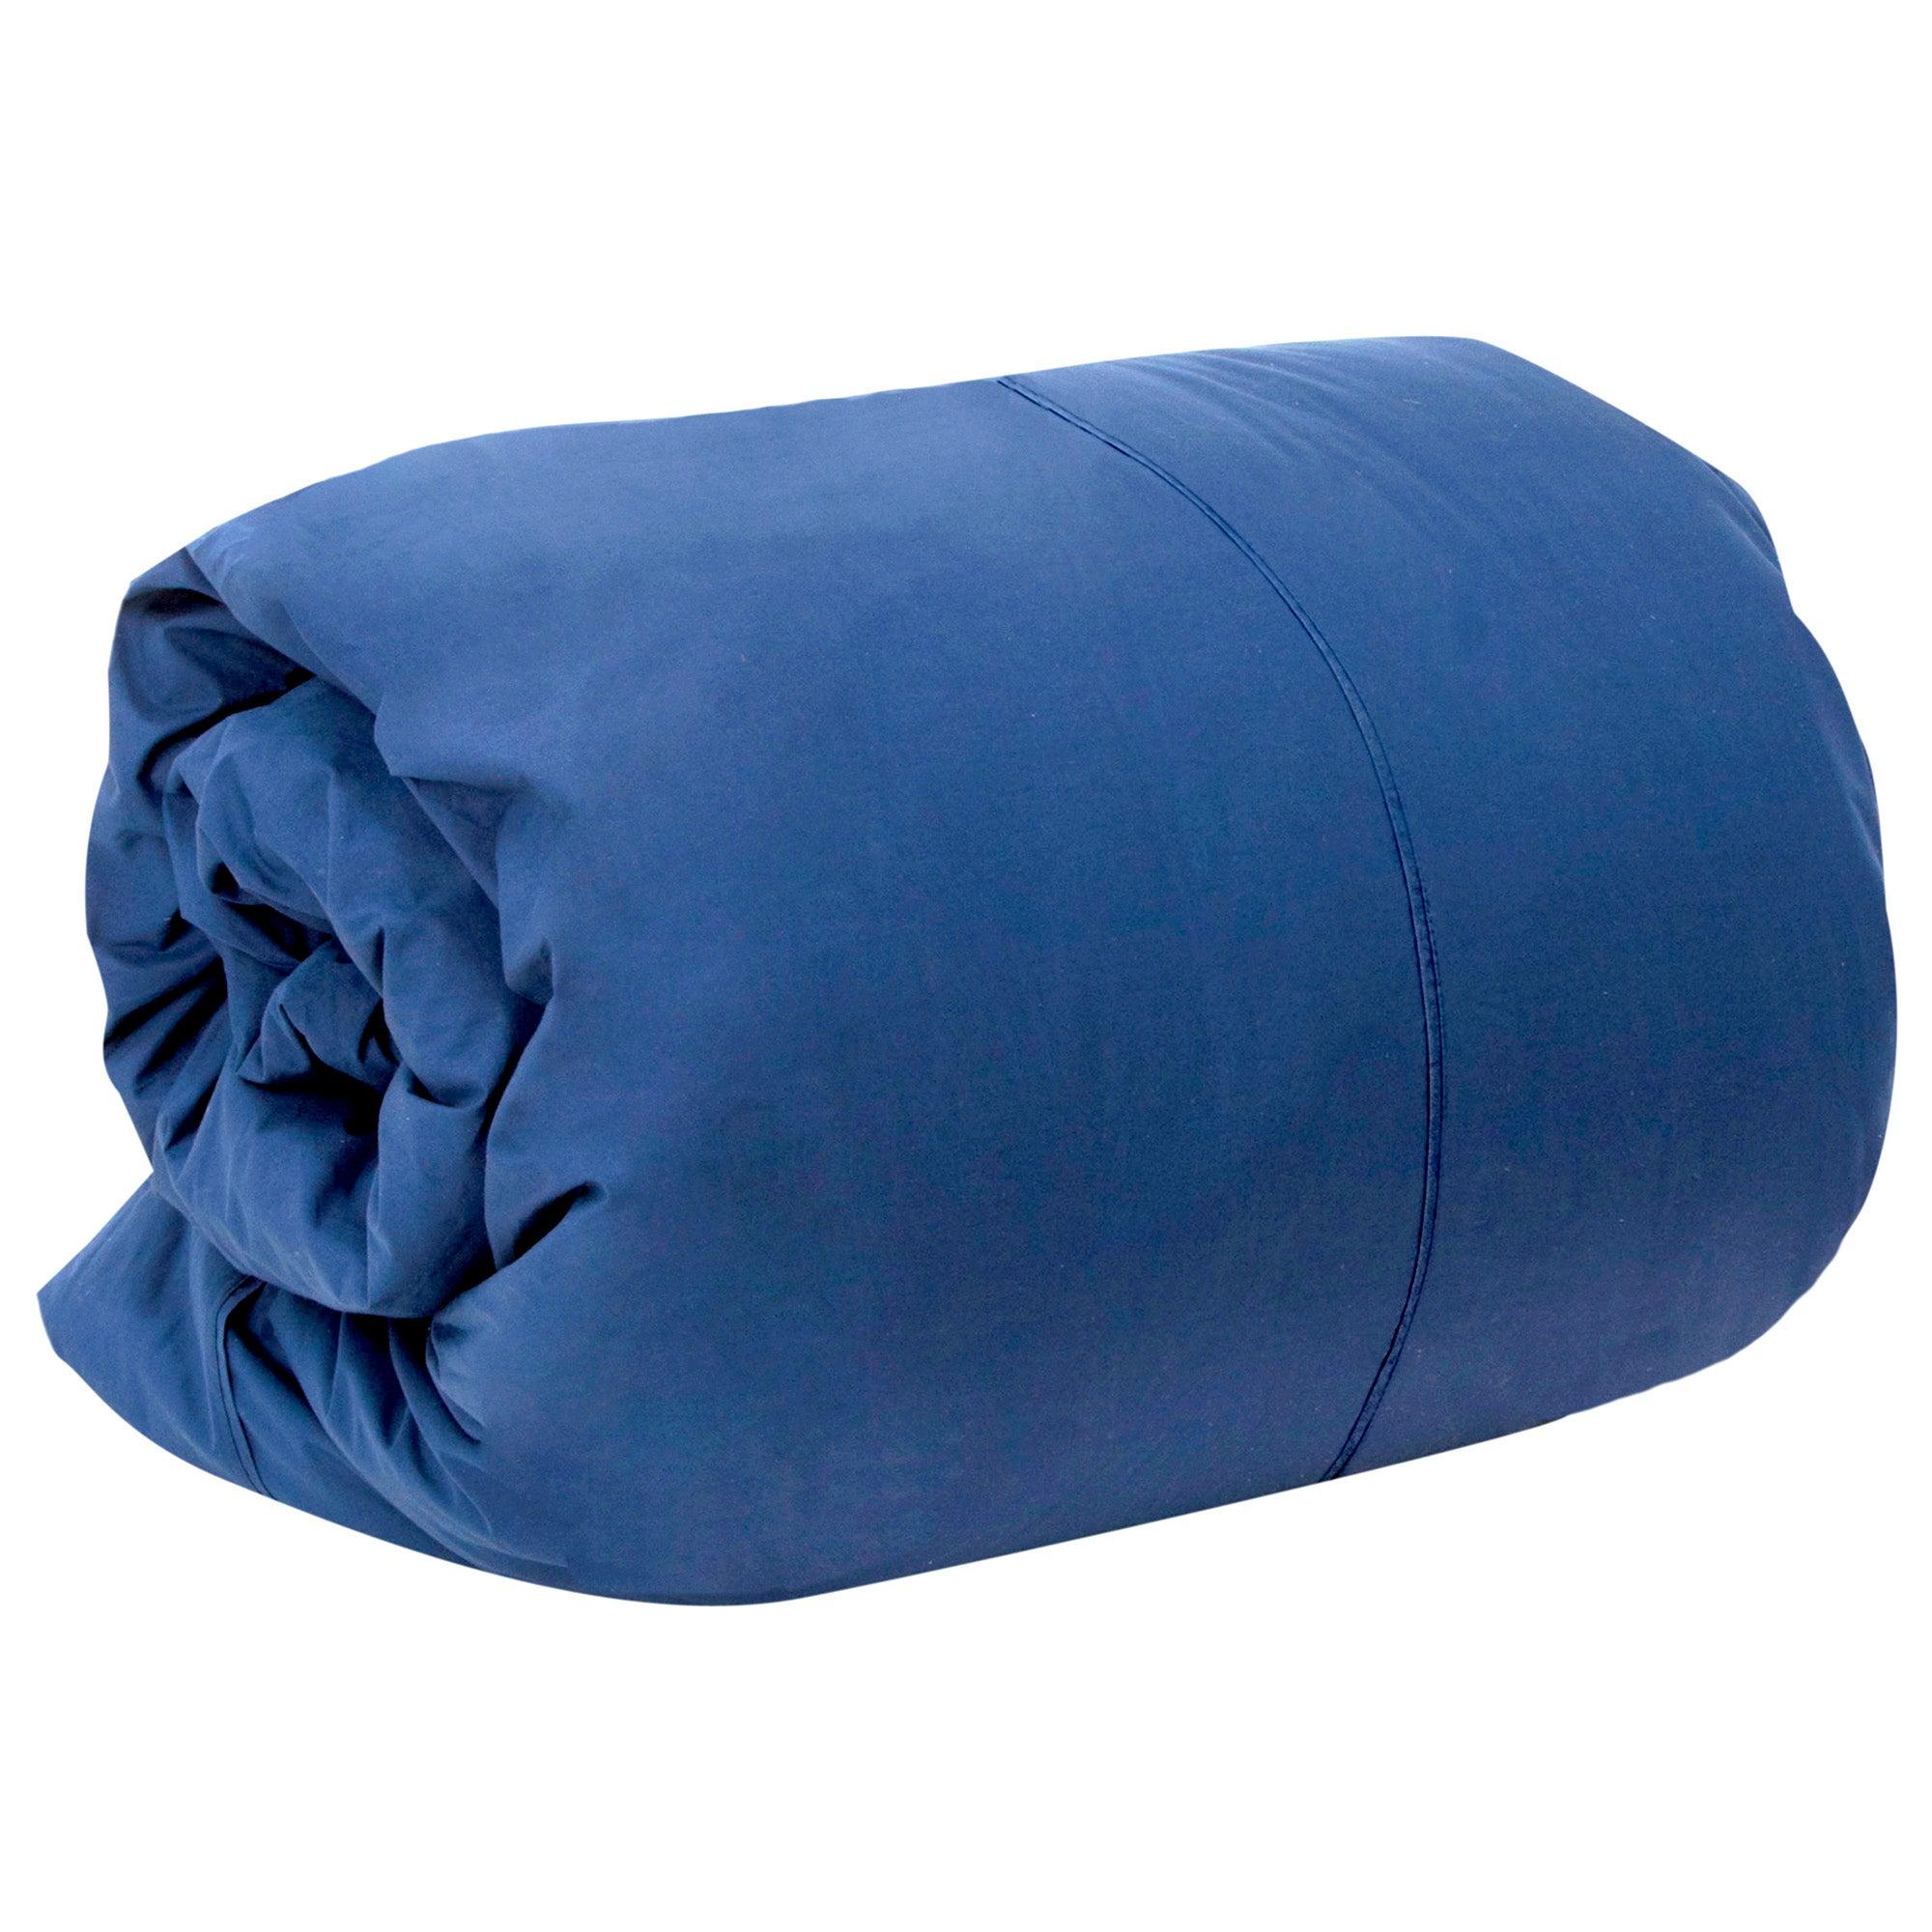 Dorma 300 Thread Count Navy Plain Dye Collection Duvet Cover